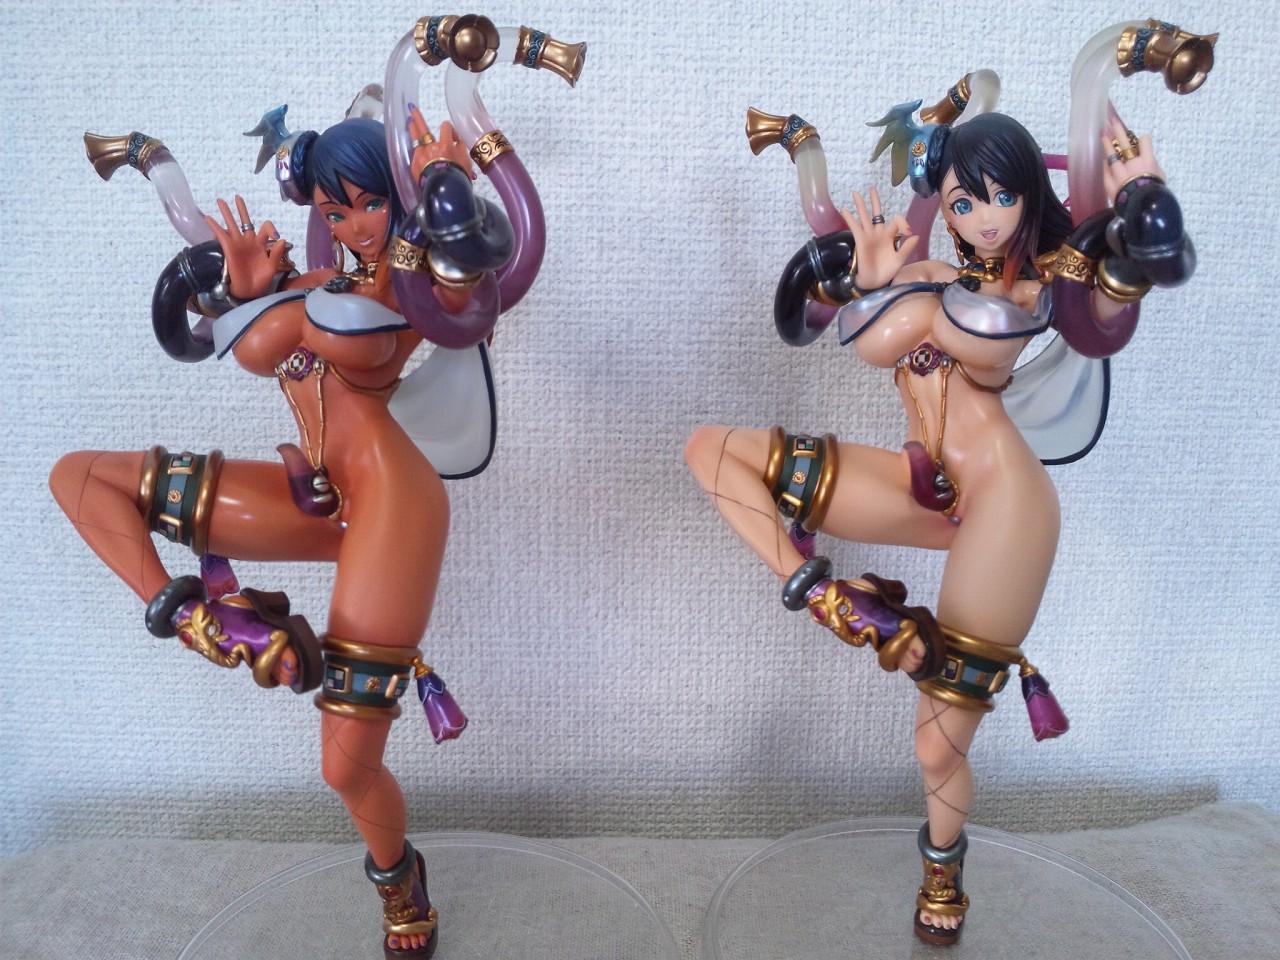 megahouse queen's_blade_rebellion hobby_japan mohio luna_luna